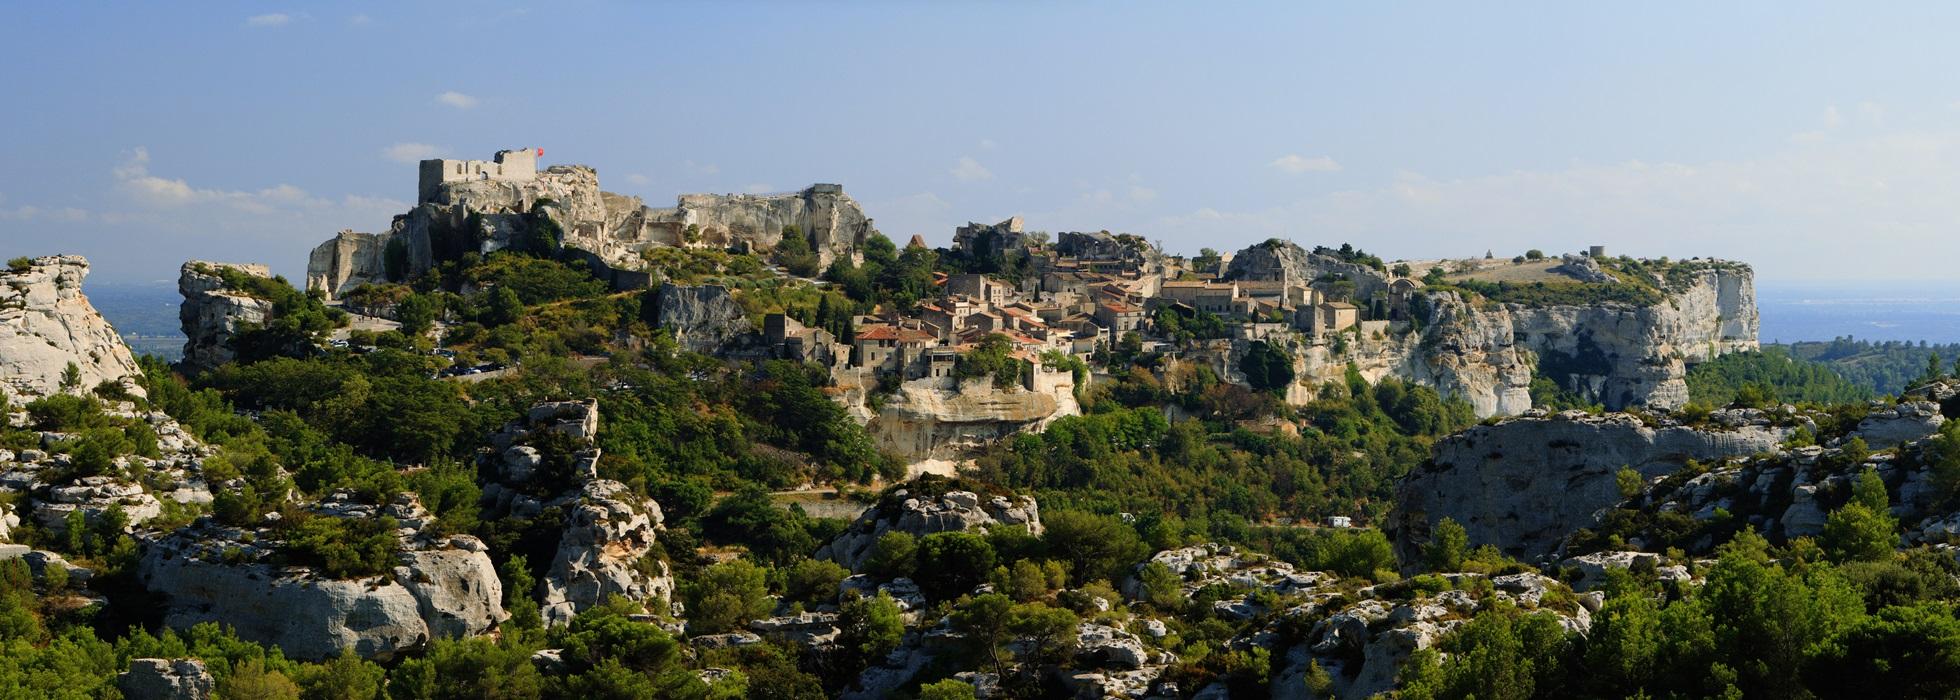 Où partir en vacances en Provence ?